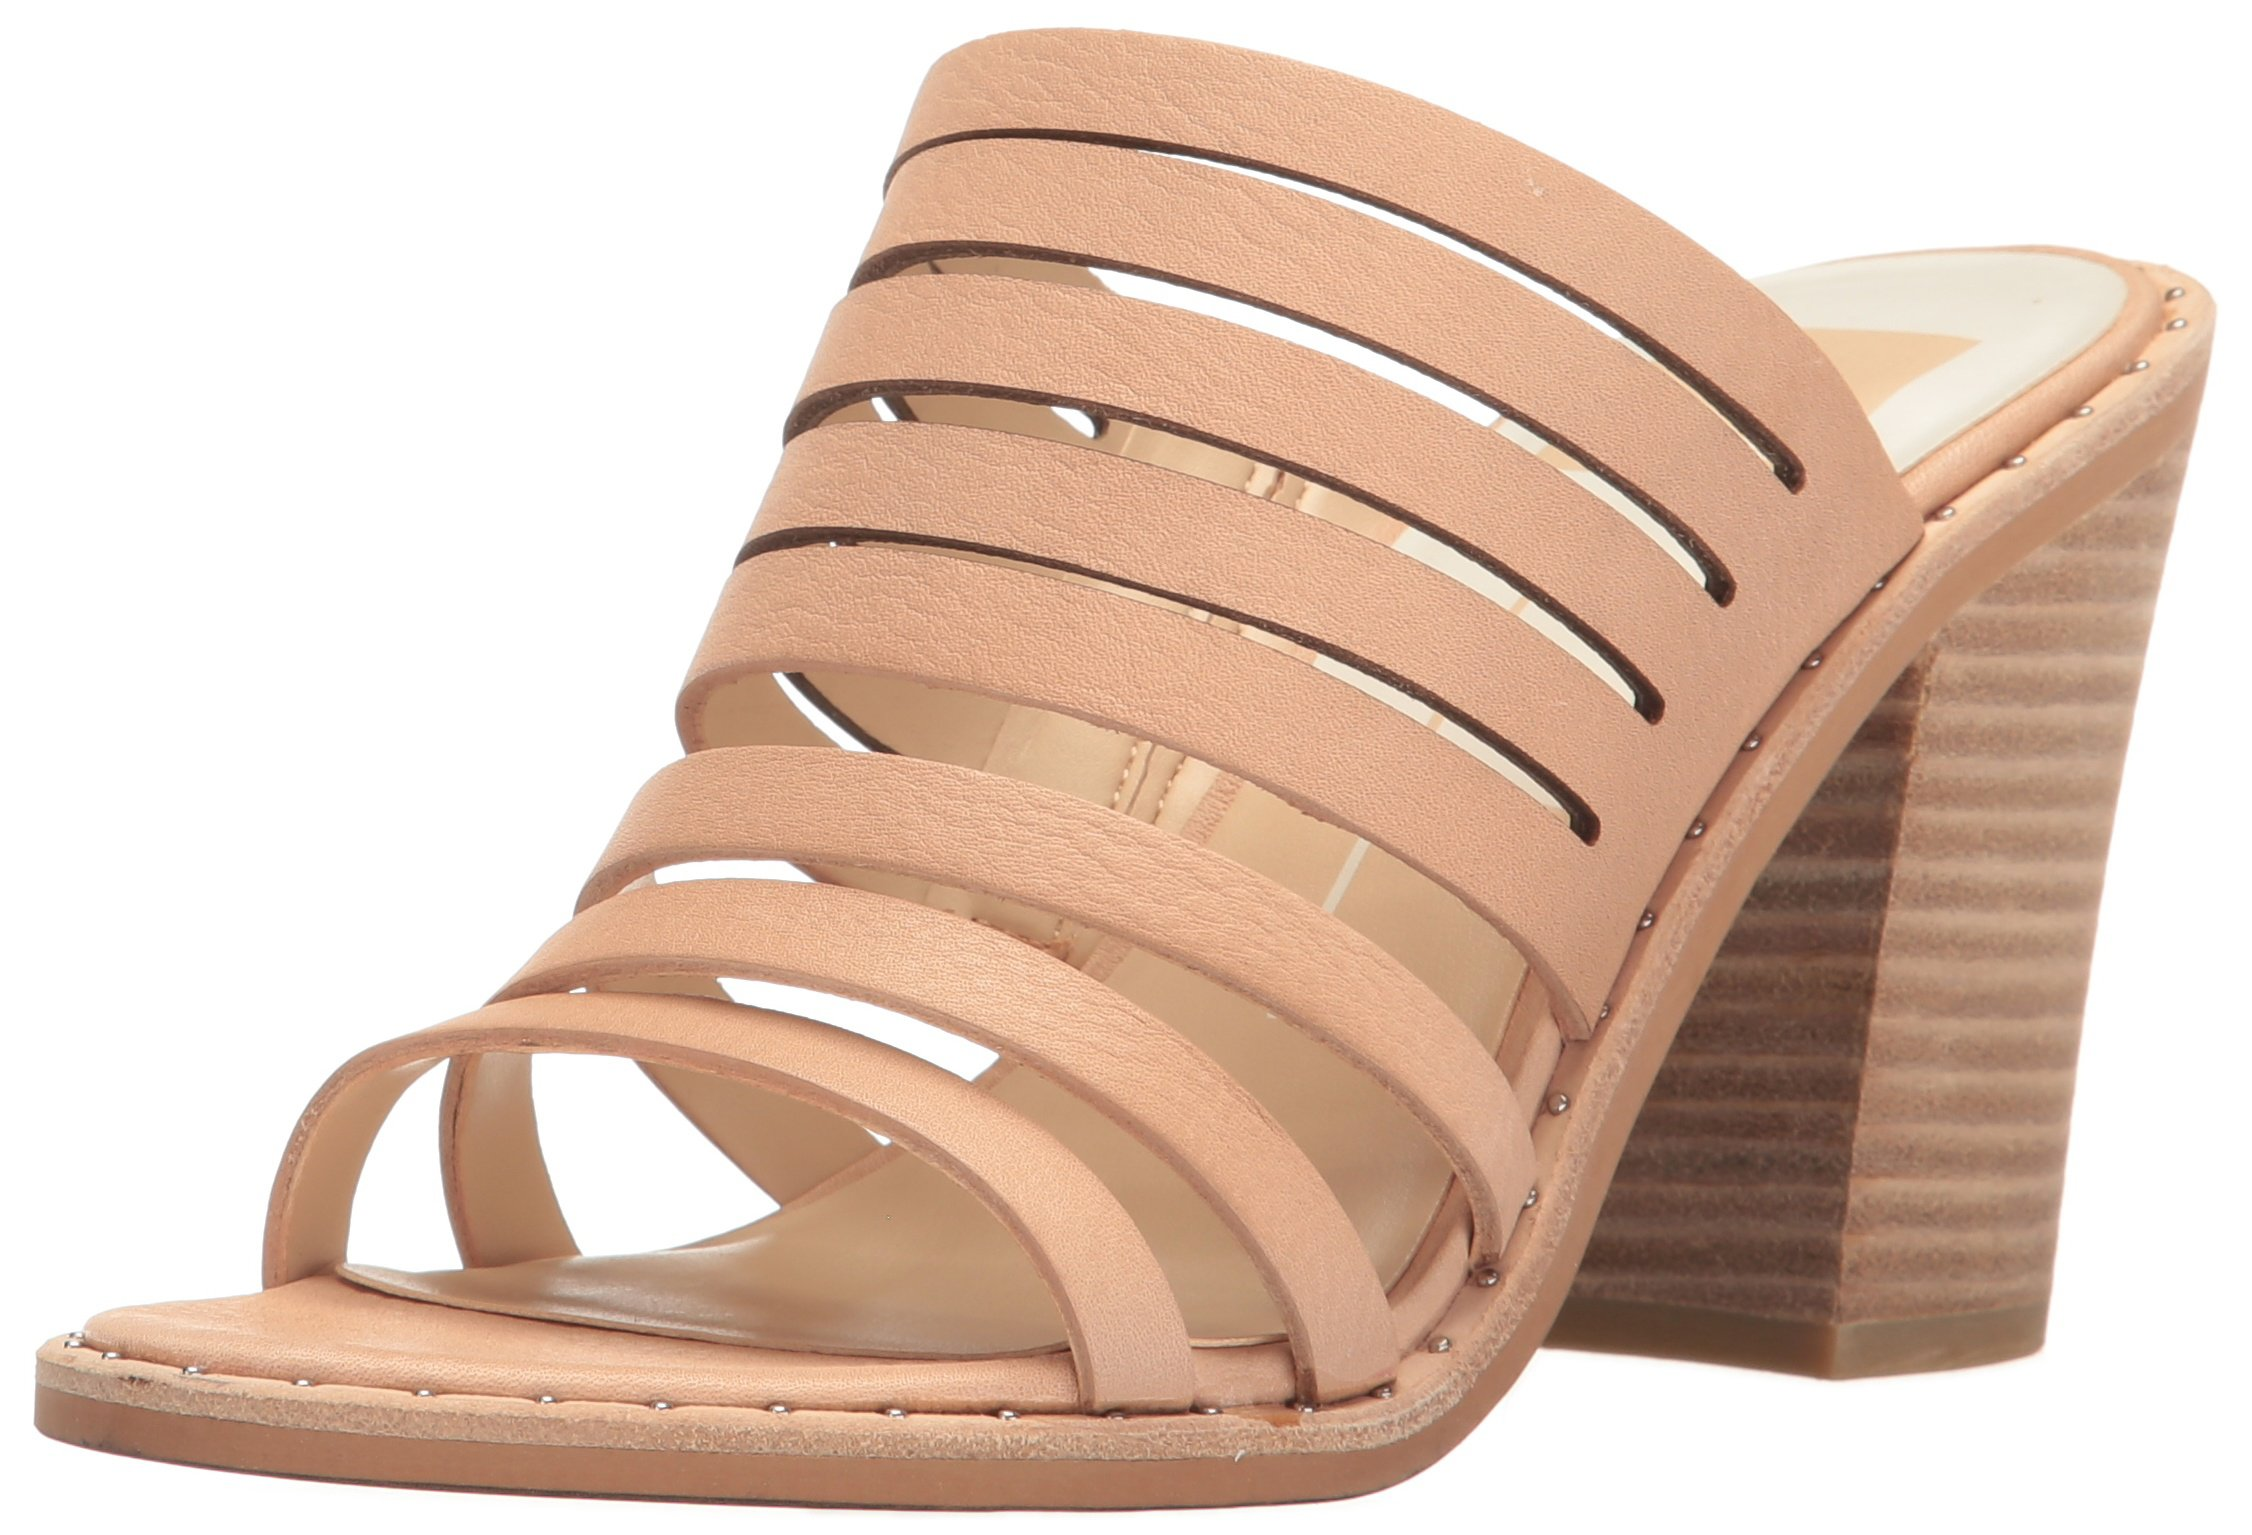 Dolce Vita Women's Lorna Heeled Sandal, Blush Leather, 8.5 M US